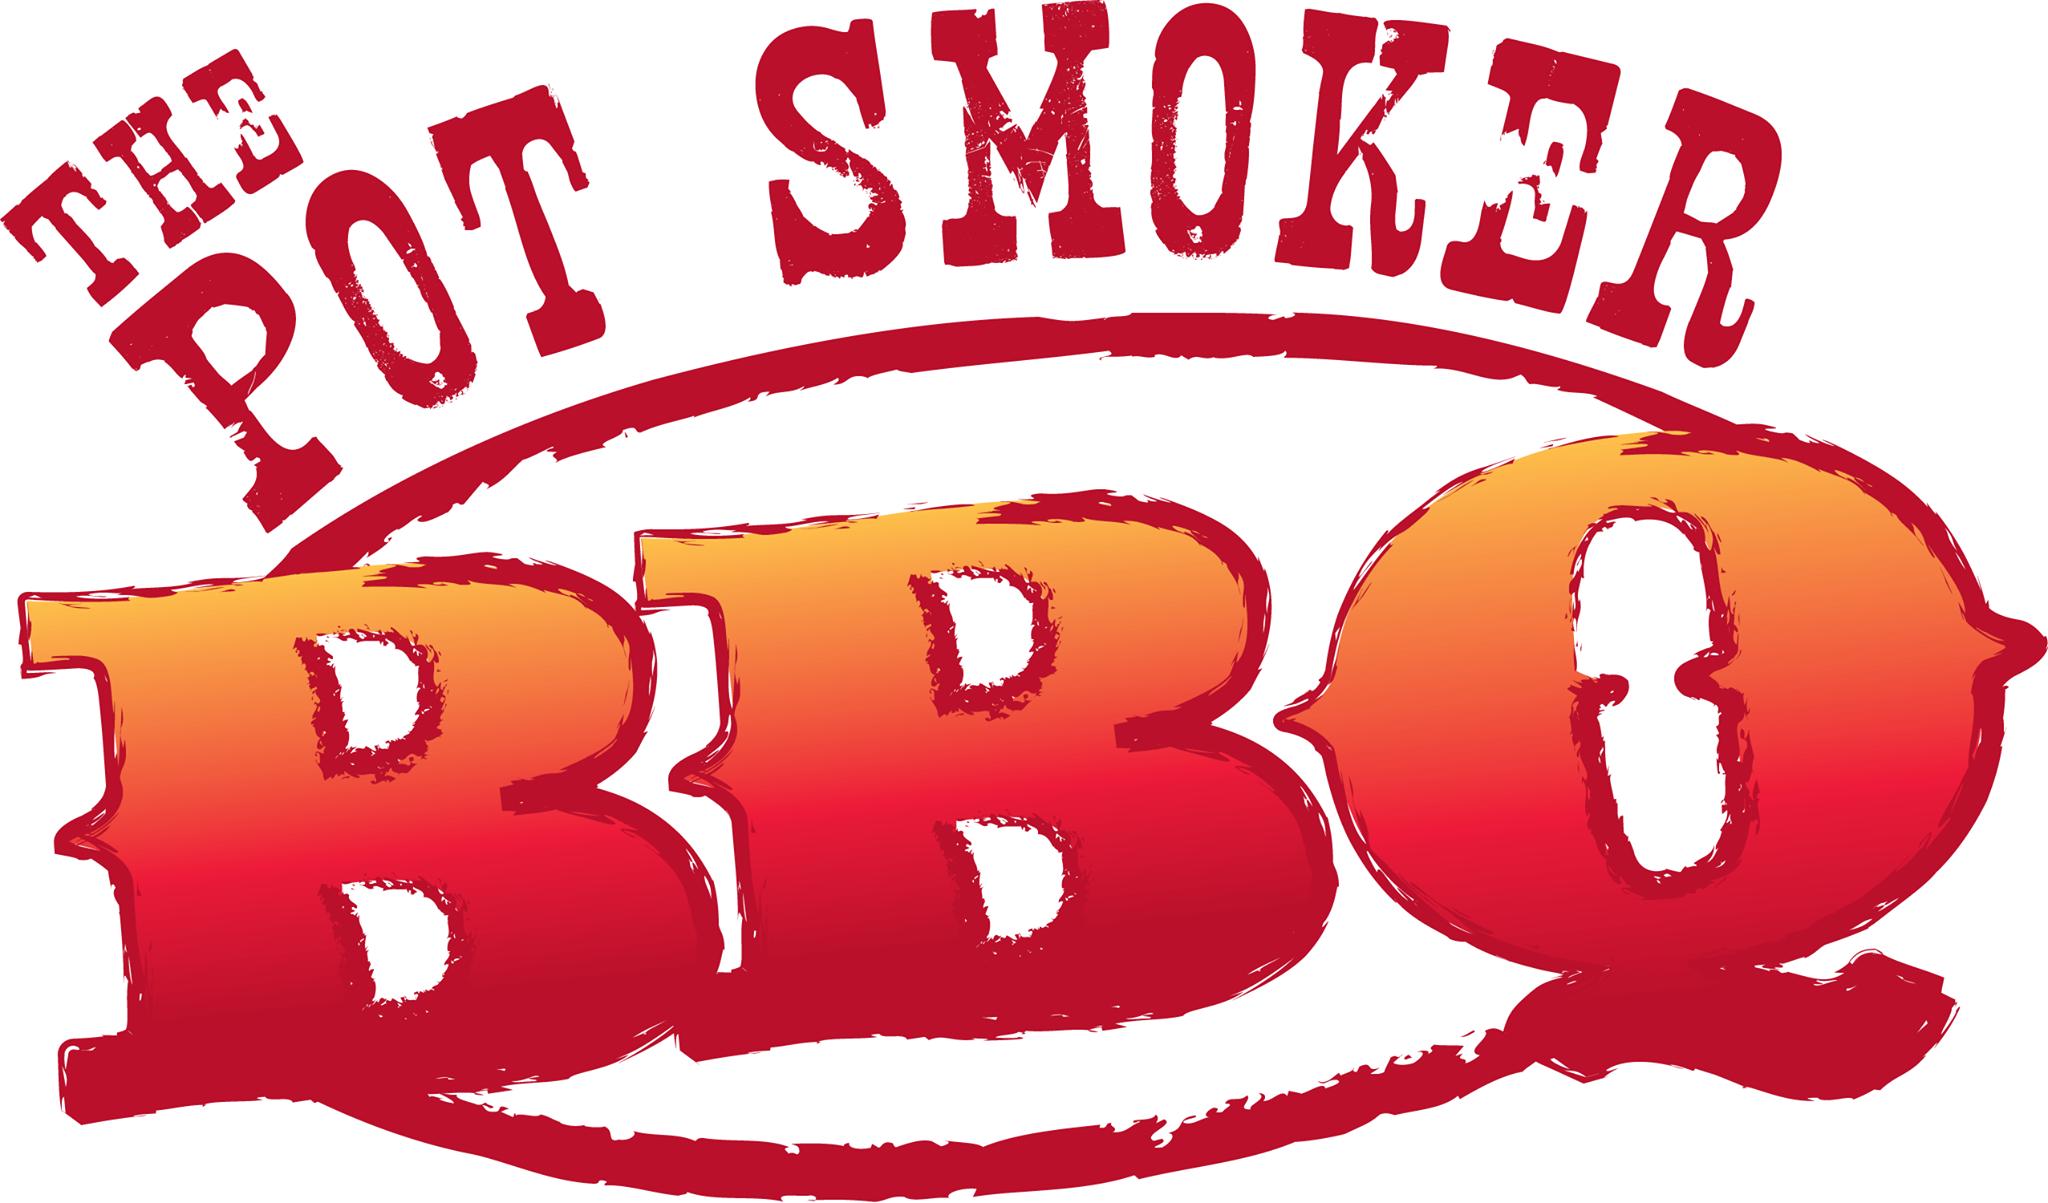 The Pot Smoker BBQ (0.3 mile)